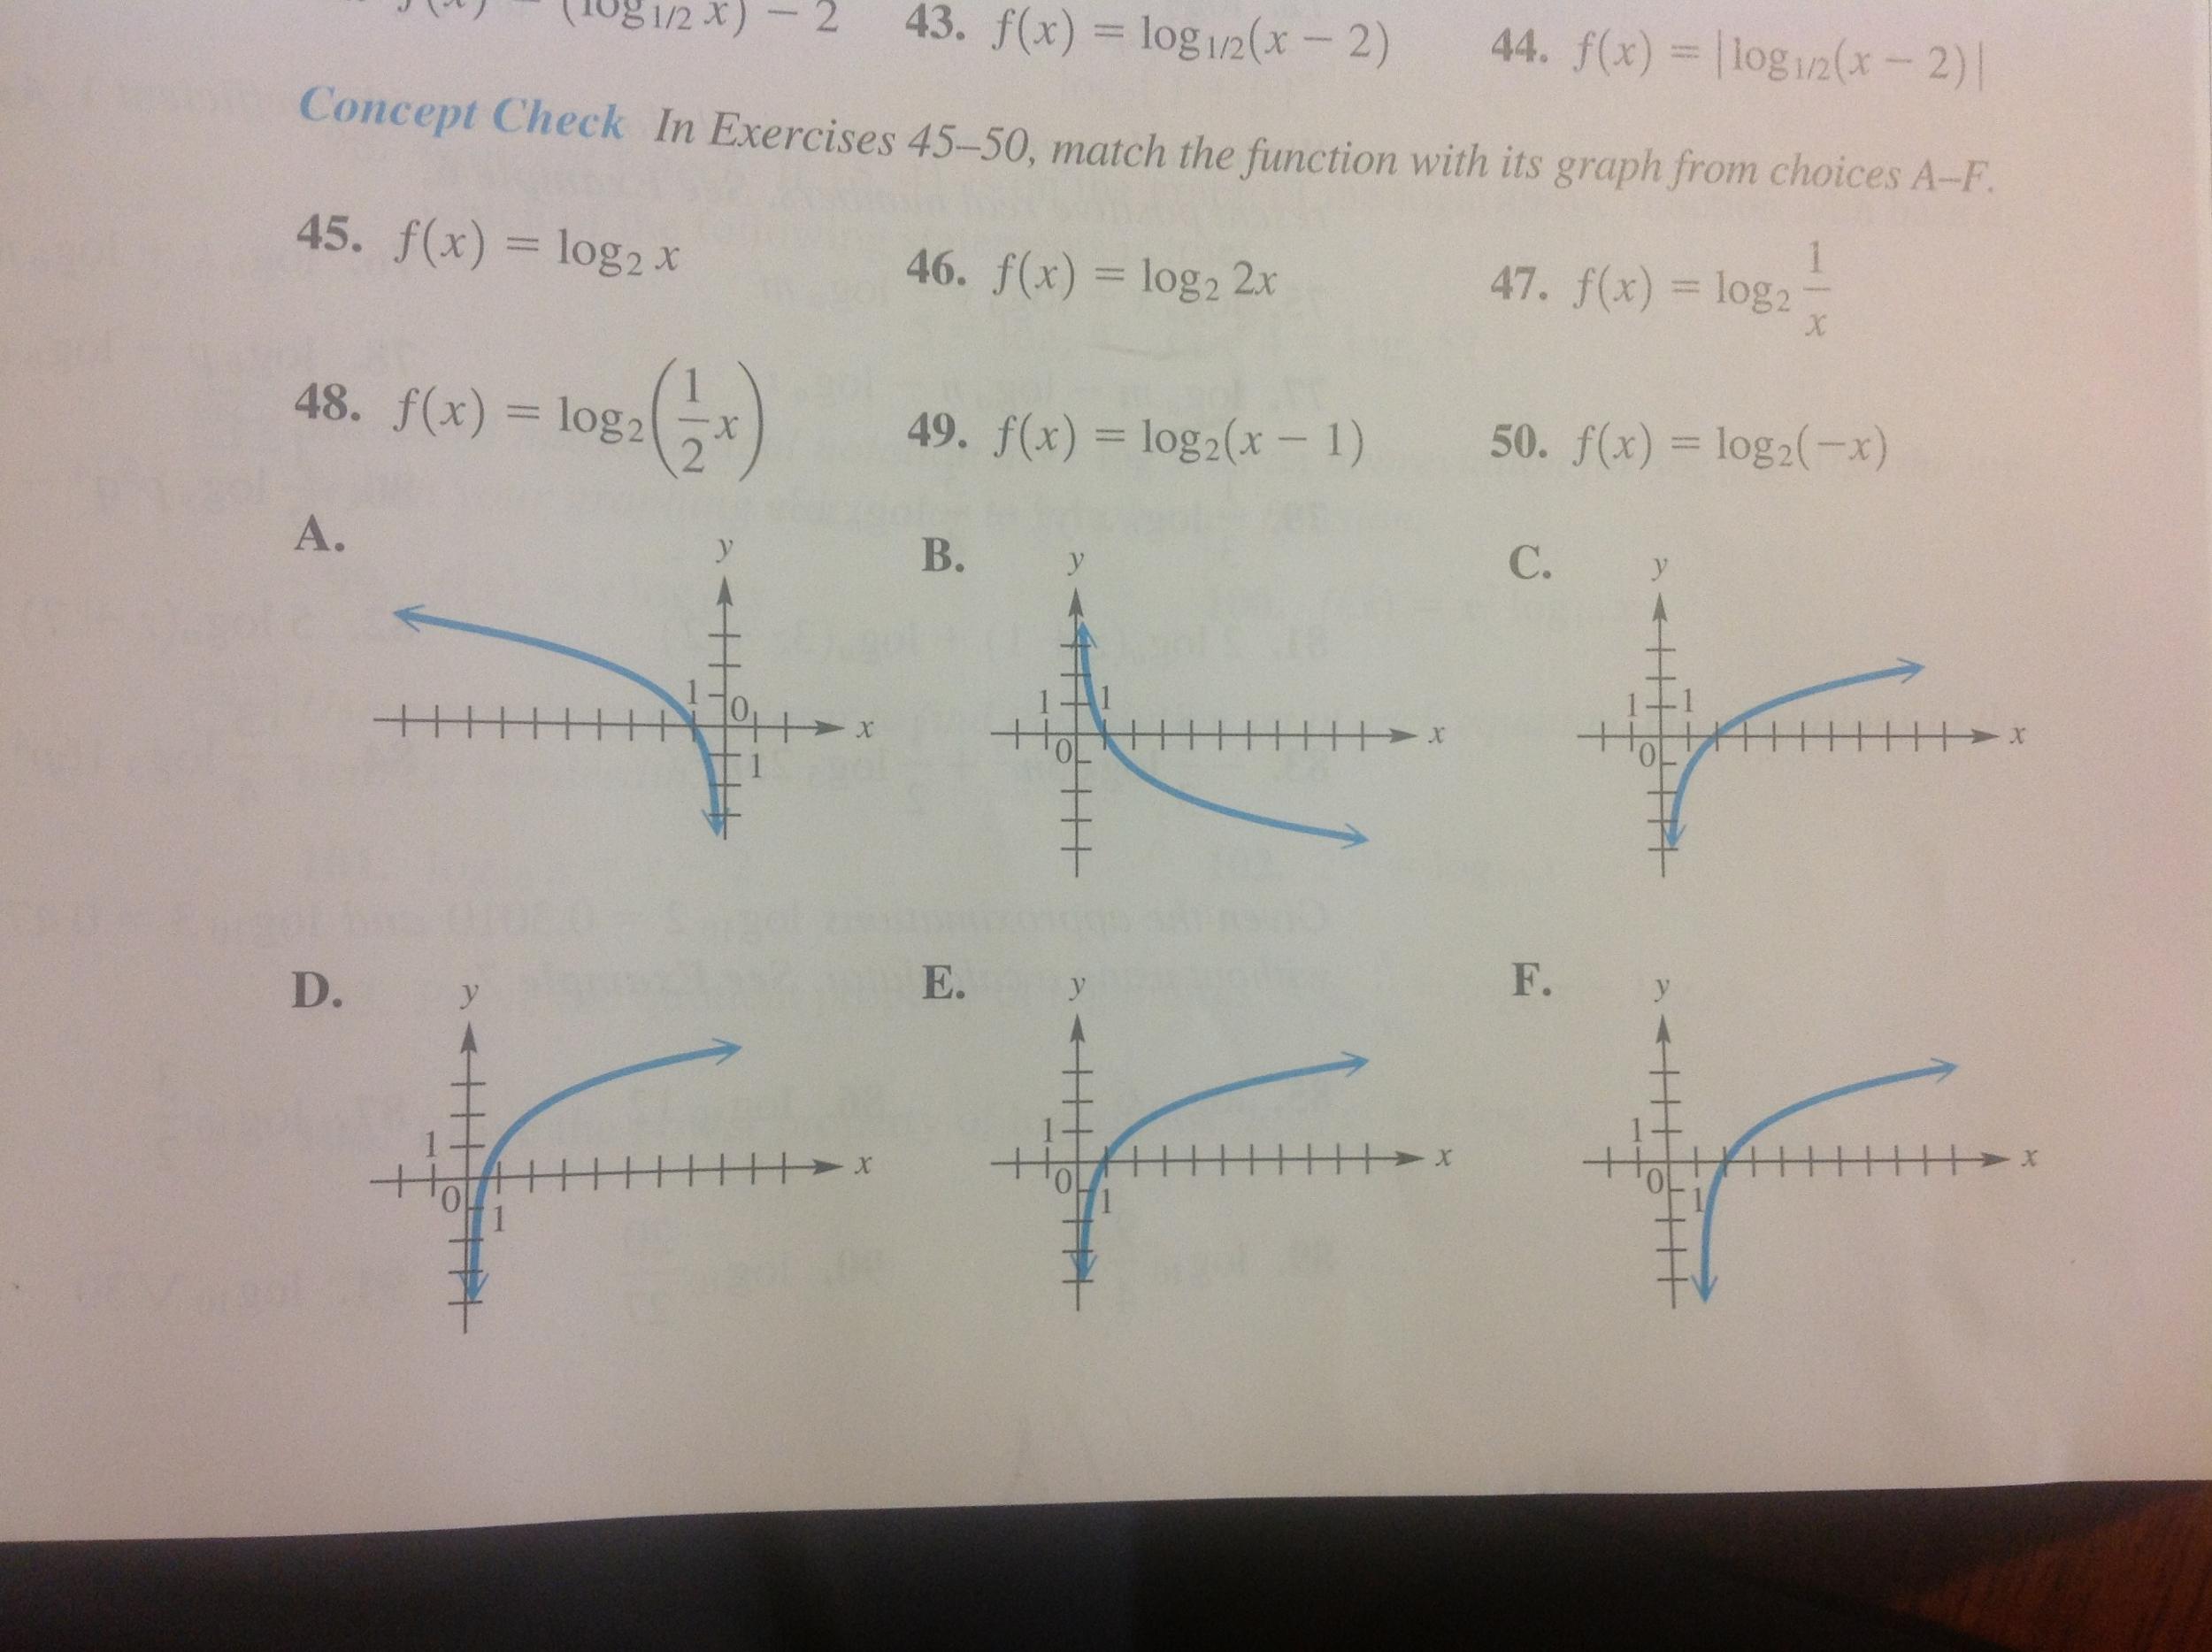 F(x) = Log1/2(x - 2) F(x) = Log1/2(x-2) Concept ...